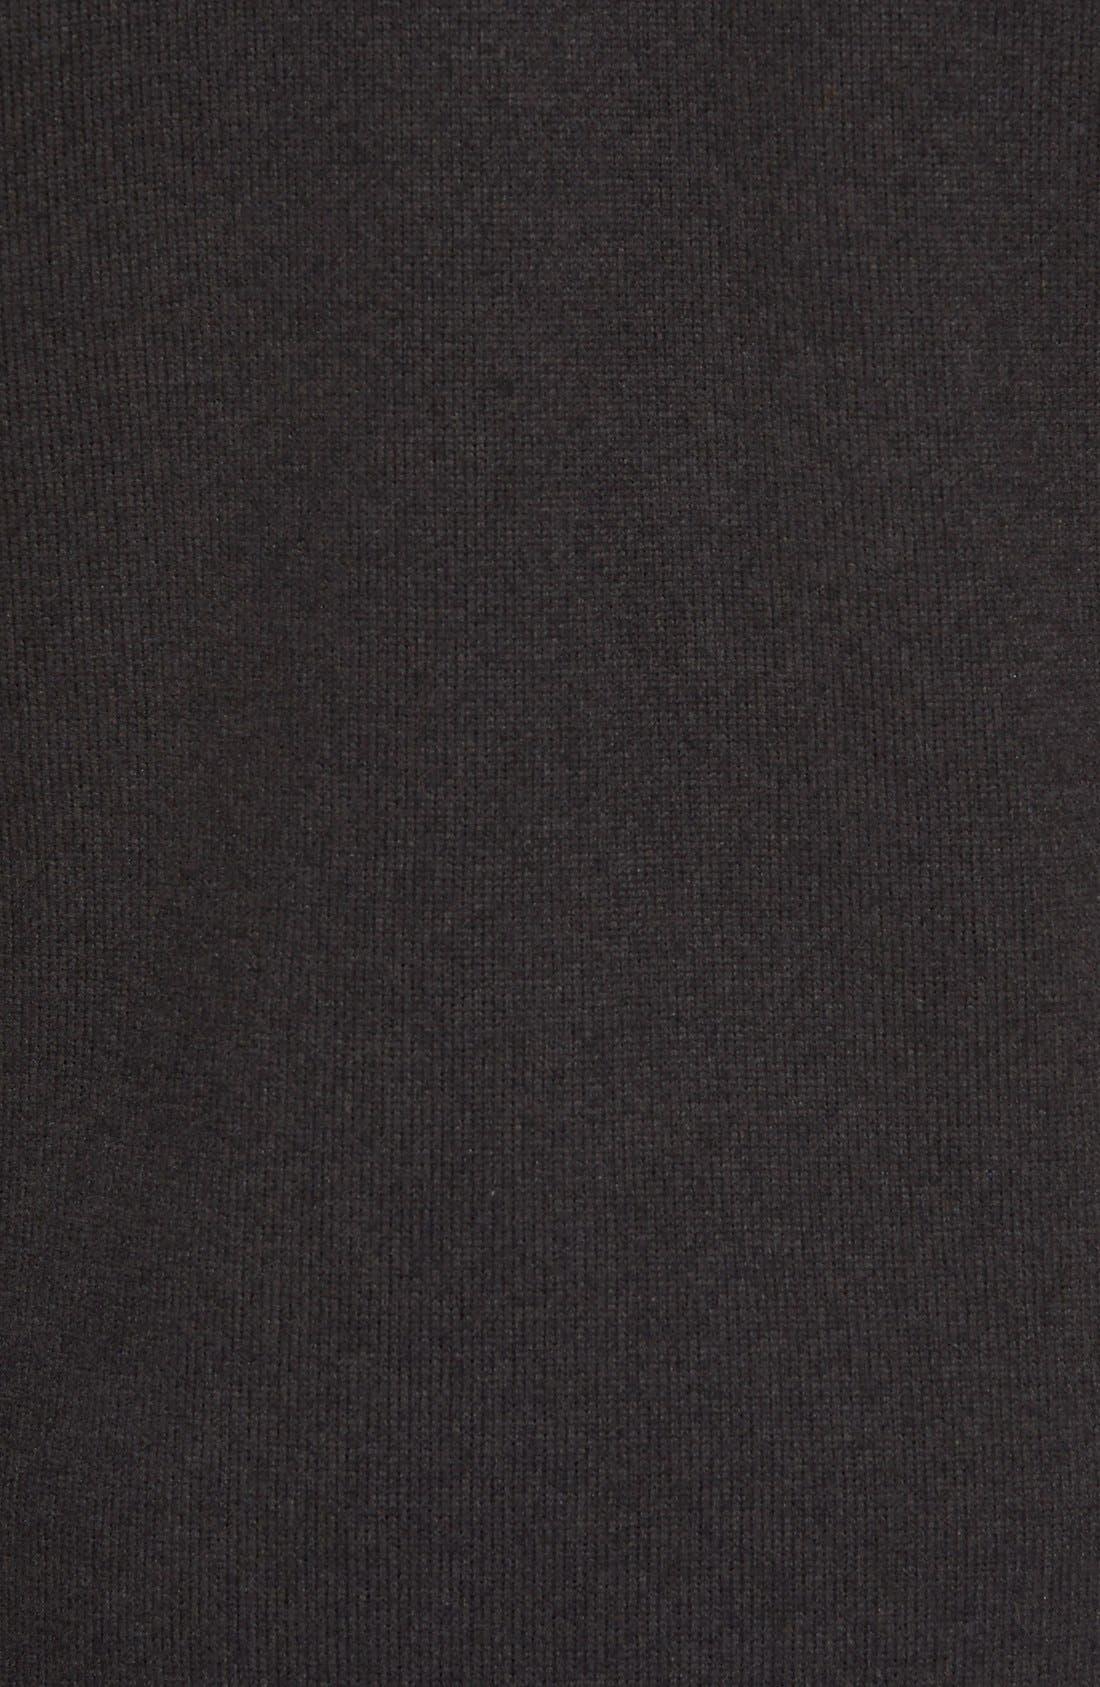 THE NORTH FACE, 'Gordon Lyons' Zip Fleece Jacket, Alternate thumbnail 7, color, 001